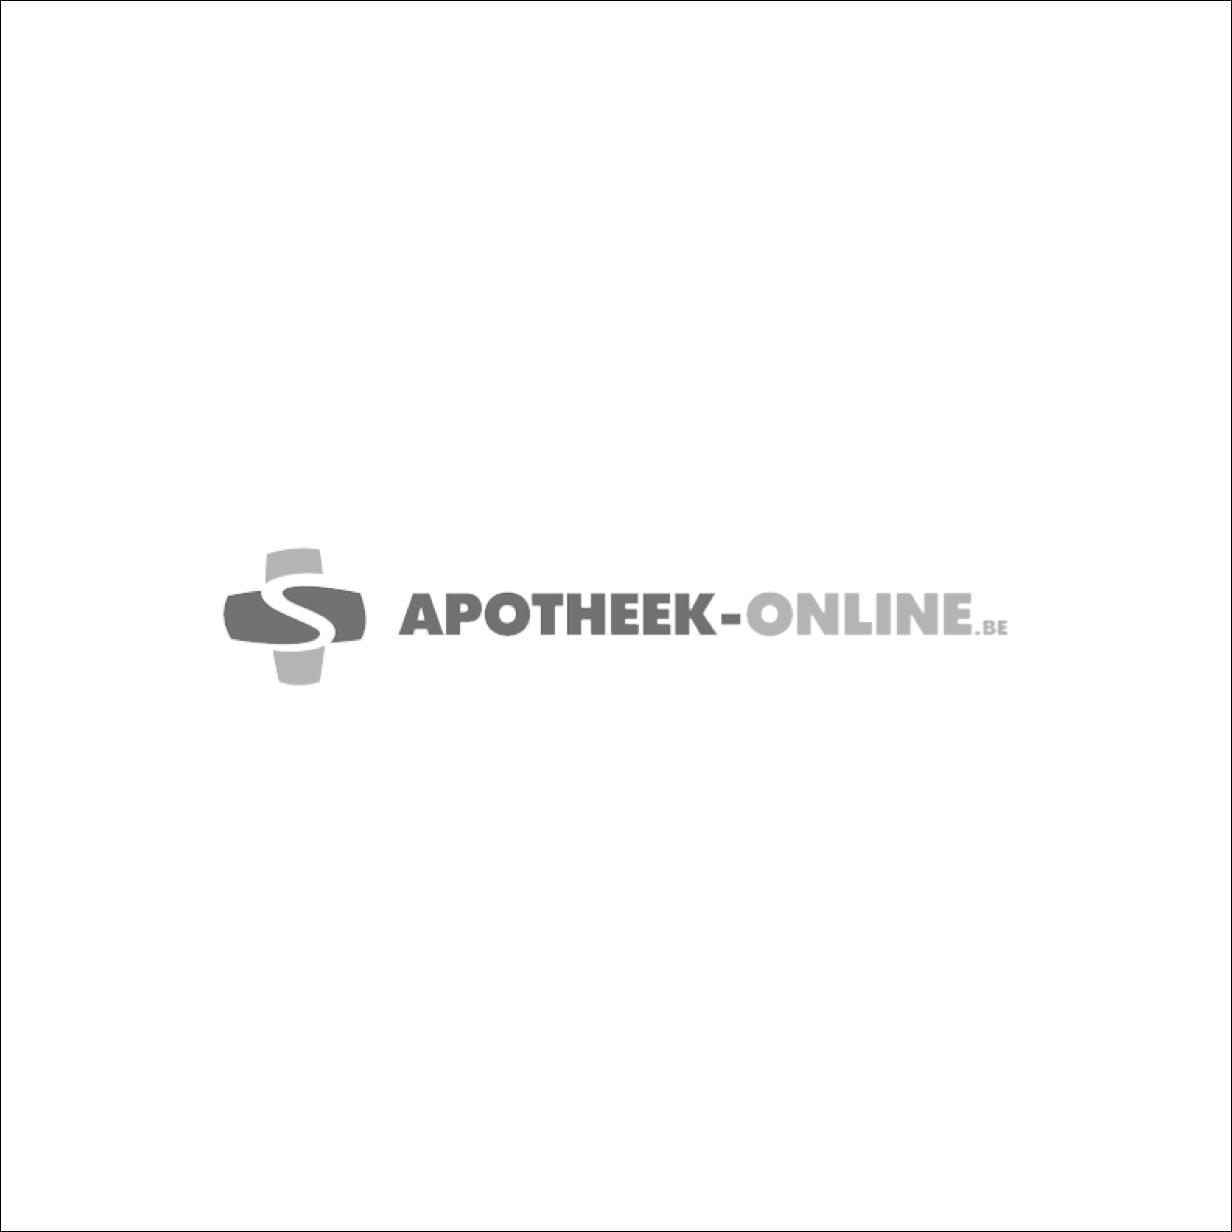 MEDICOMP KP STER 6PL 10X 10CM 25X2 4217350